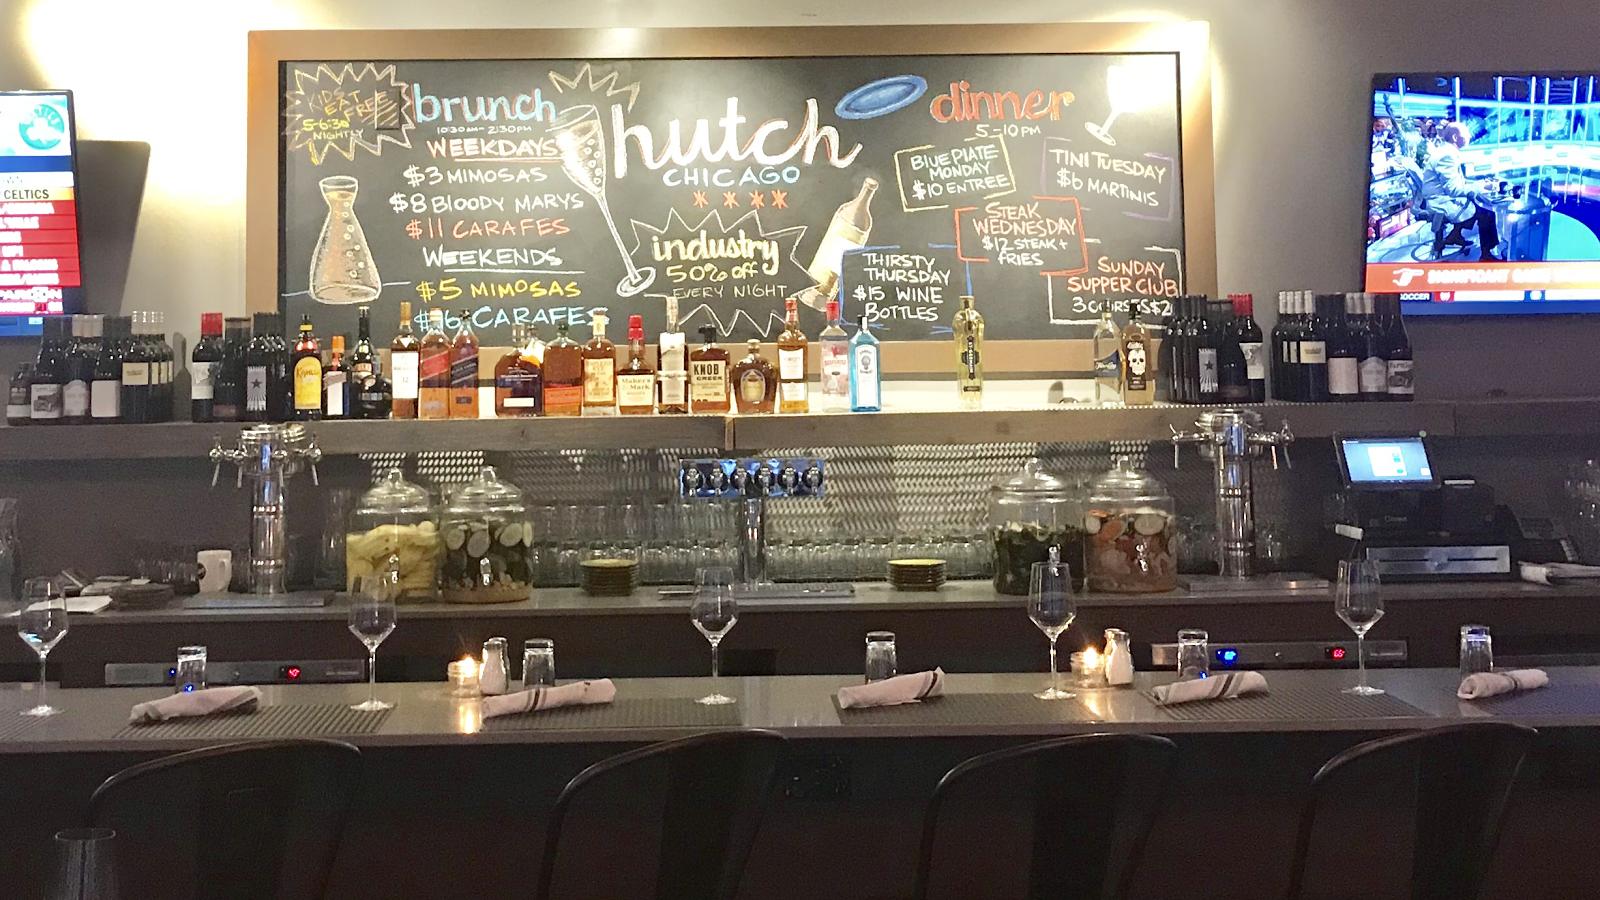 Hutch American Kitchen + Bar   Chicago | Restaurant Review   Zagat